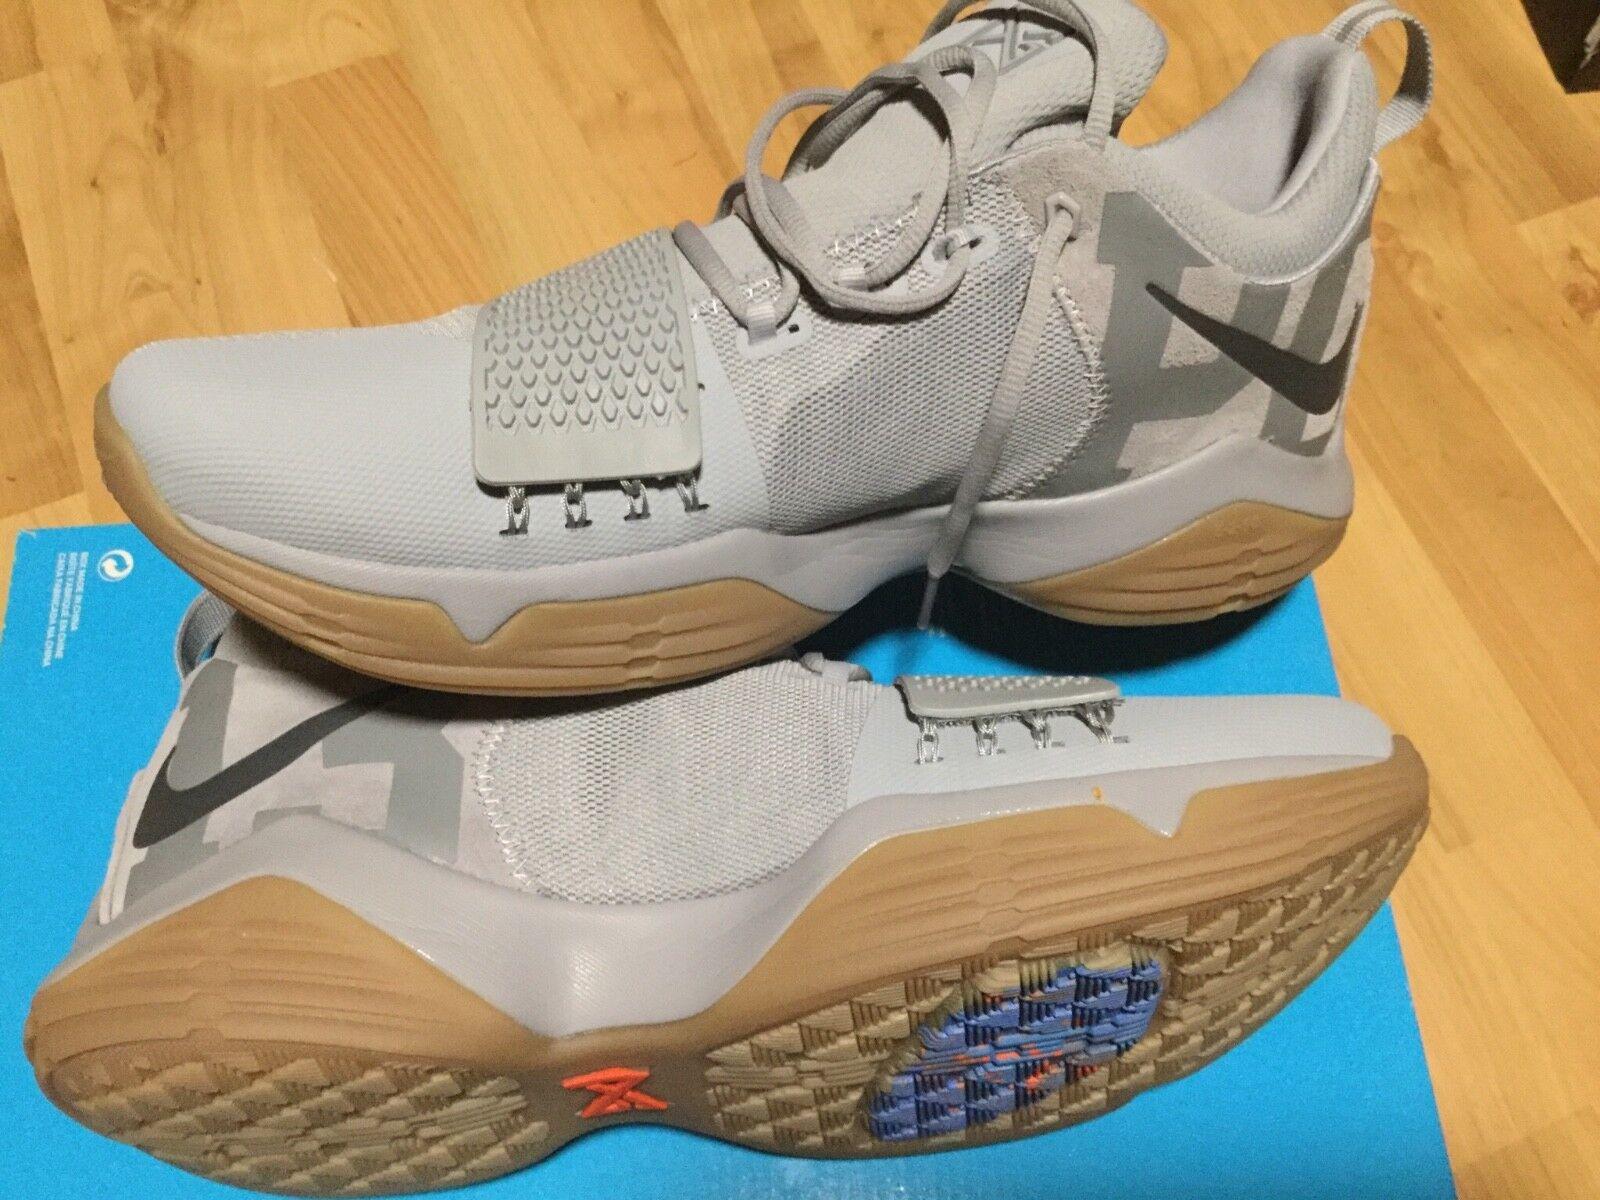 Neu Nike PG1 Paul George 13 Jordan Gr NBA Basketball Schuhe Sneaker Gr Jordan 47,5, US 13, 55f6a1